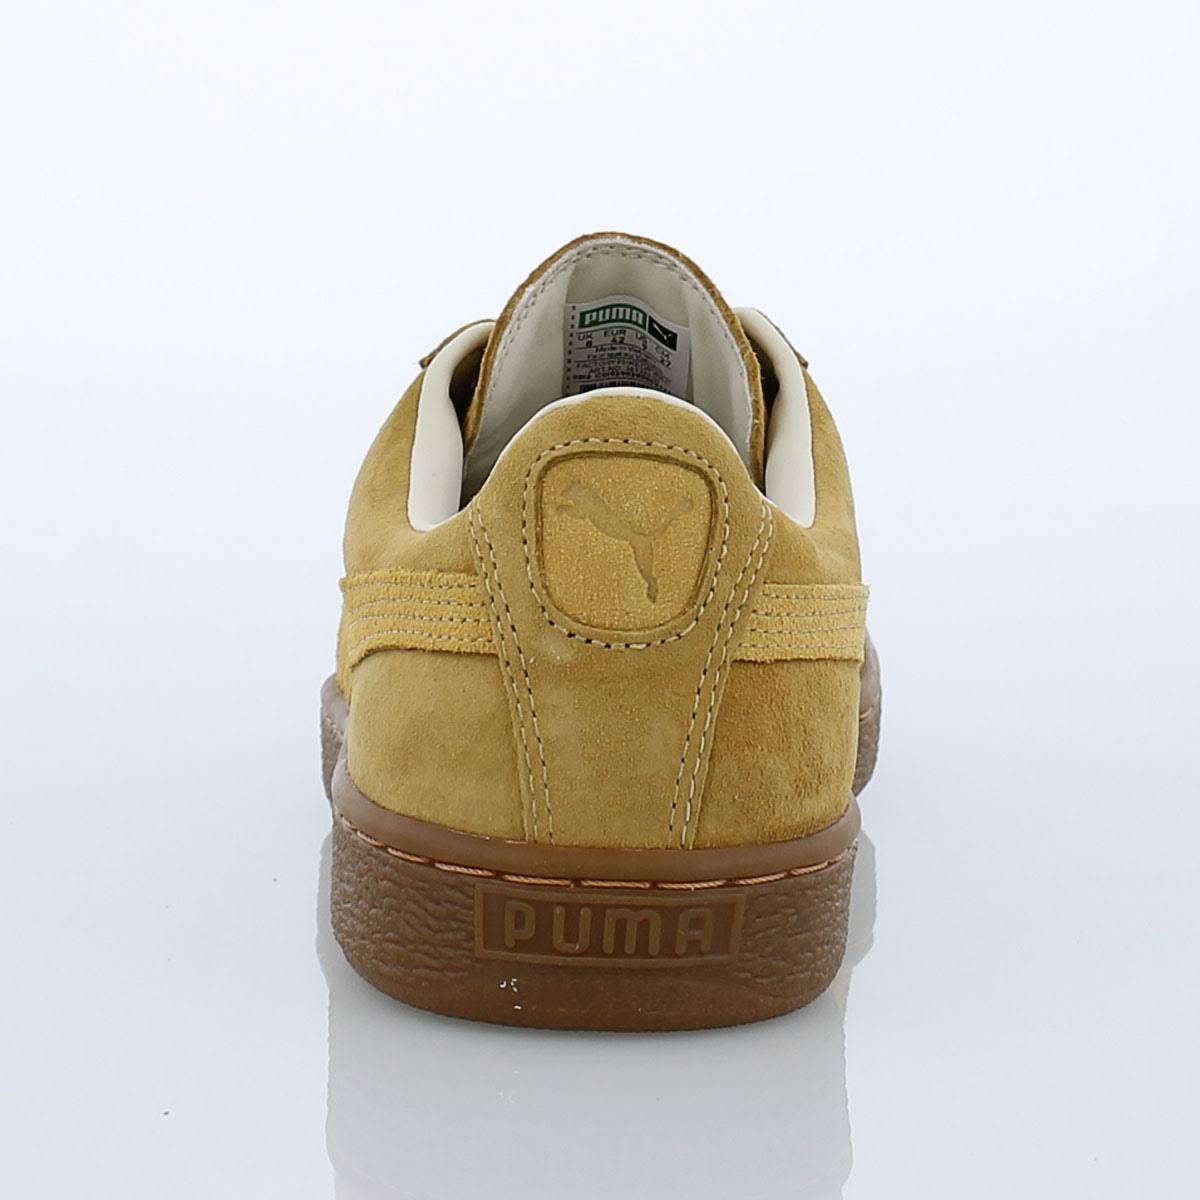 Tamaño Basket Puma 01 M Zapato De 9 Classic Nwob 361324 Winterized nFPWPHR